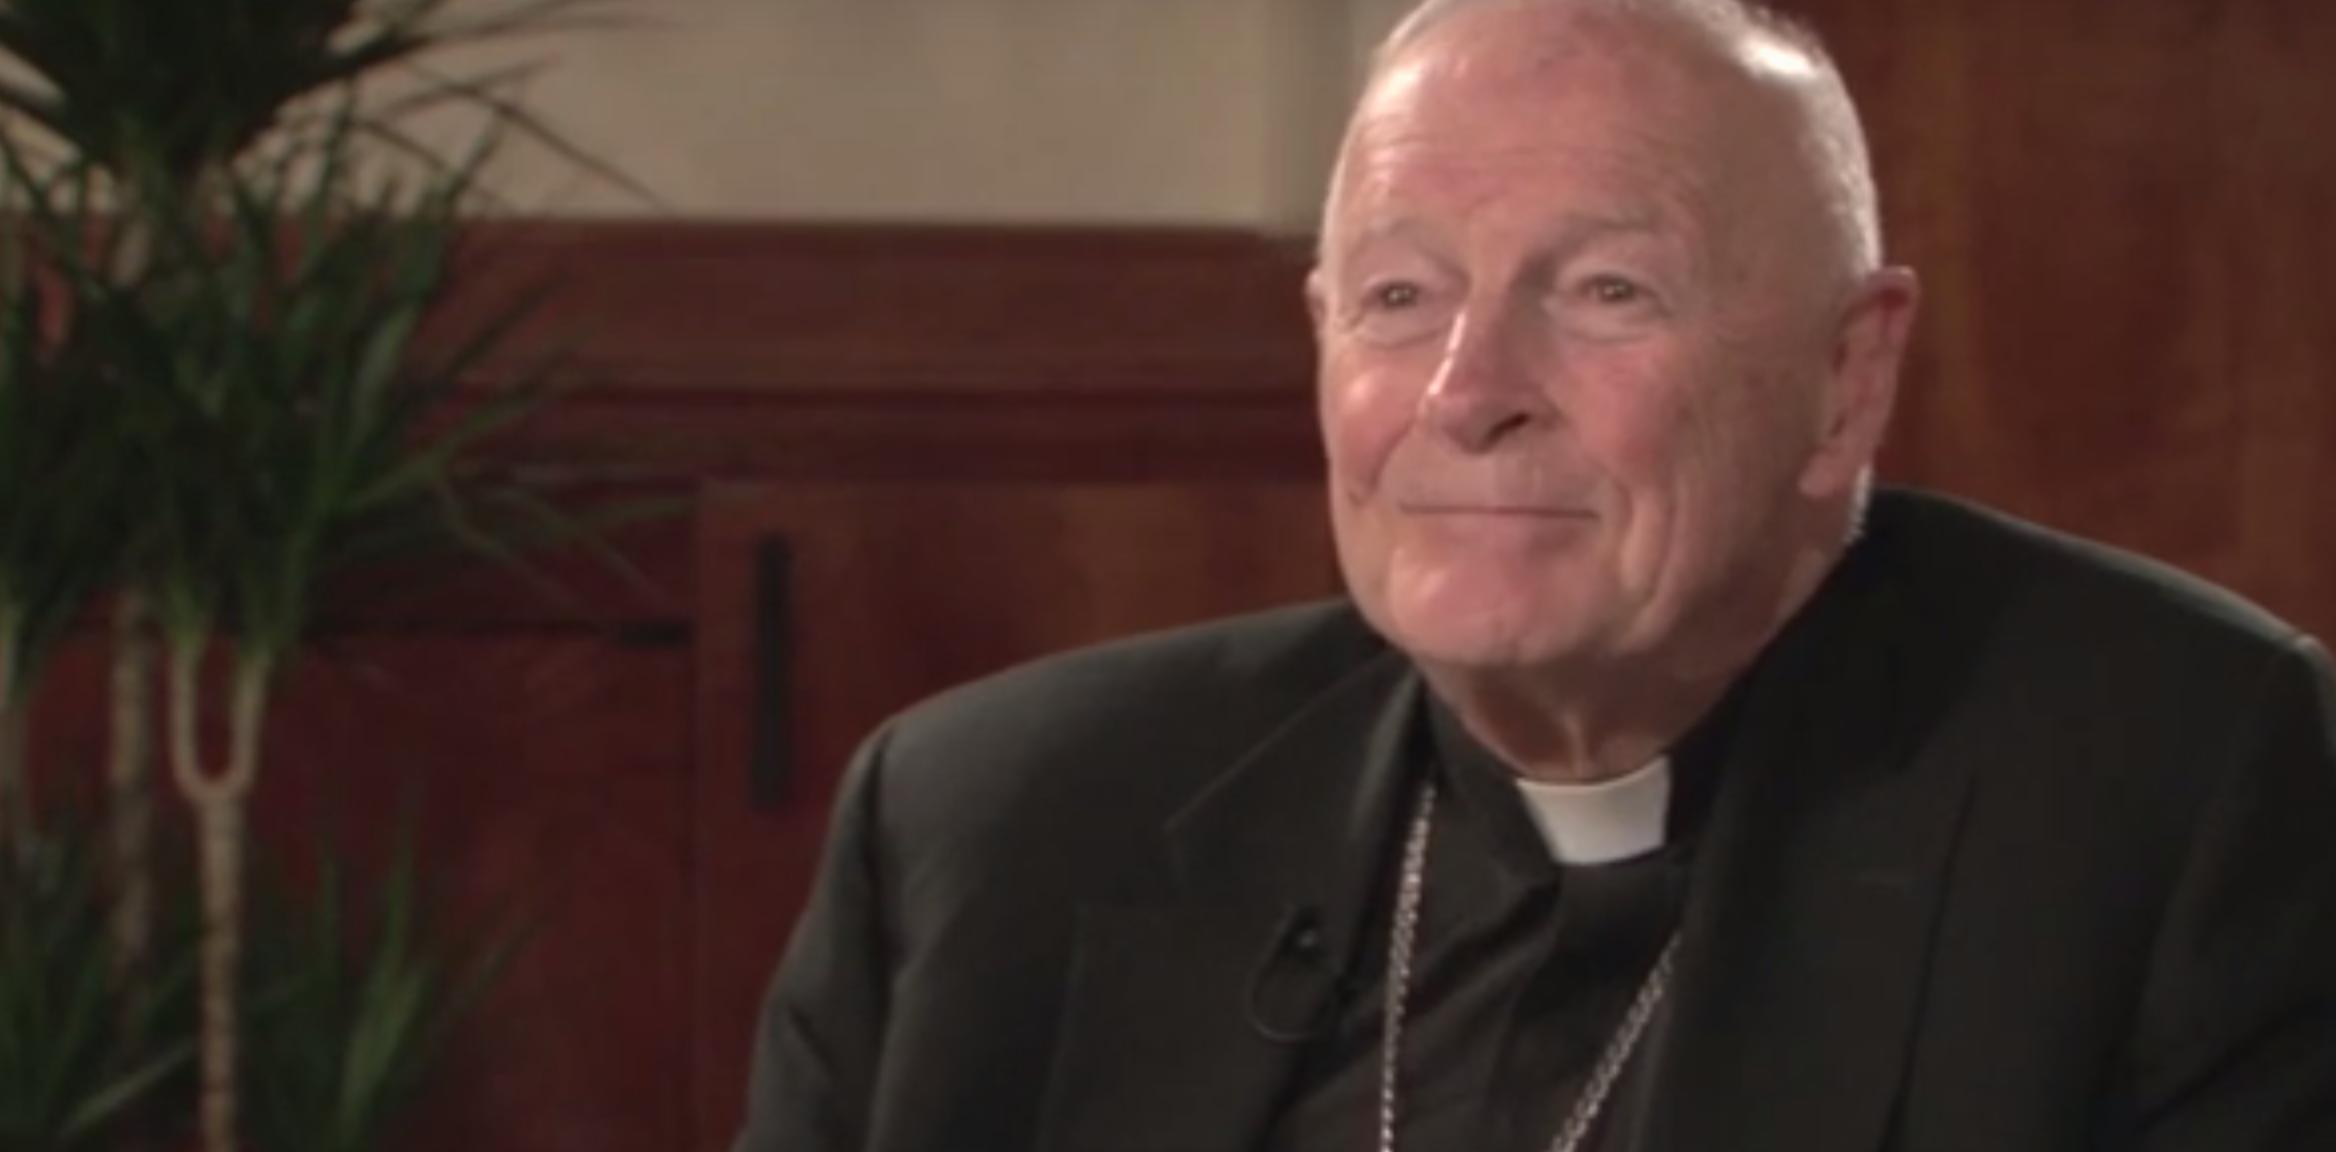 Cardinal McCarrick Youtube screen shot